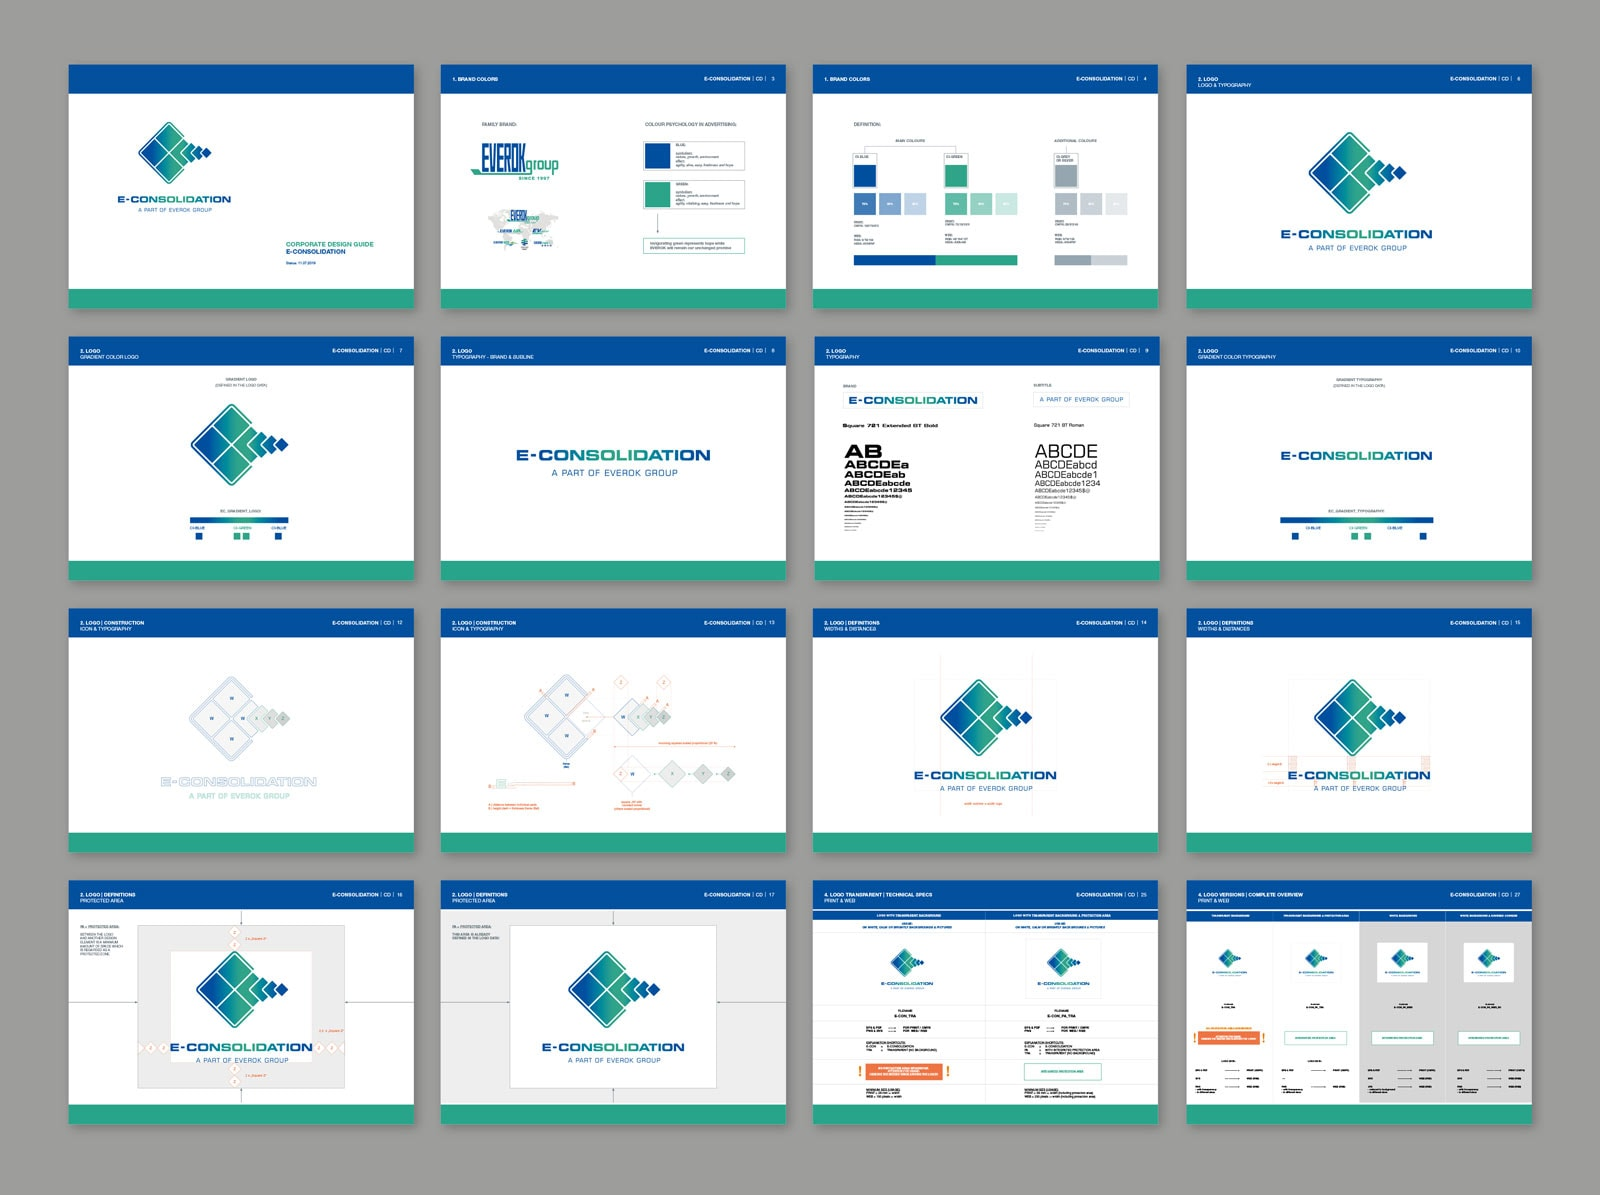 E-Consolidation, CD Guide, Styleguide, Richtlinien